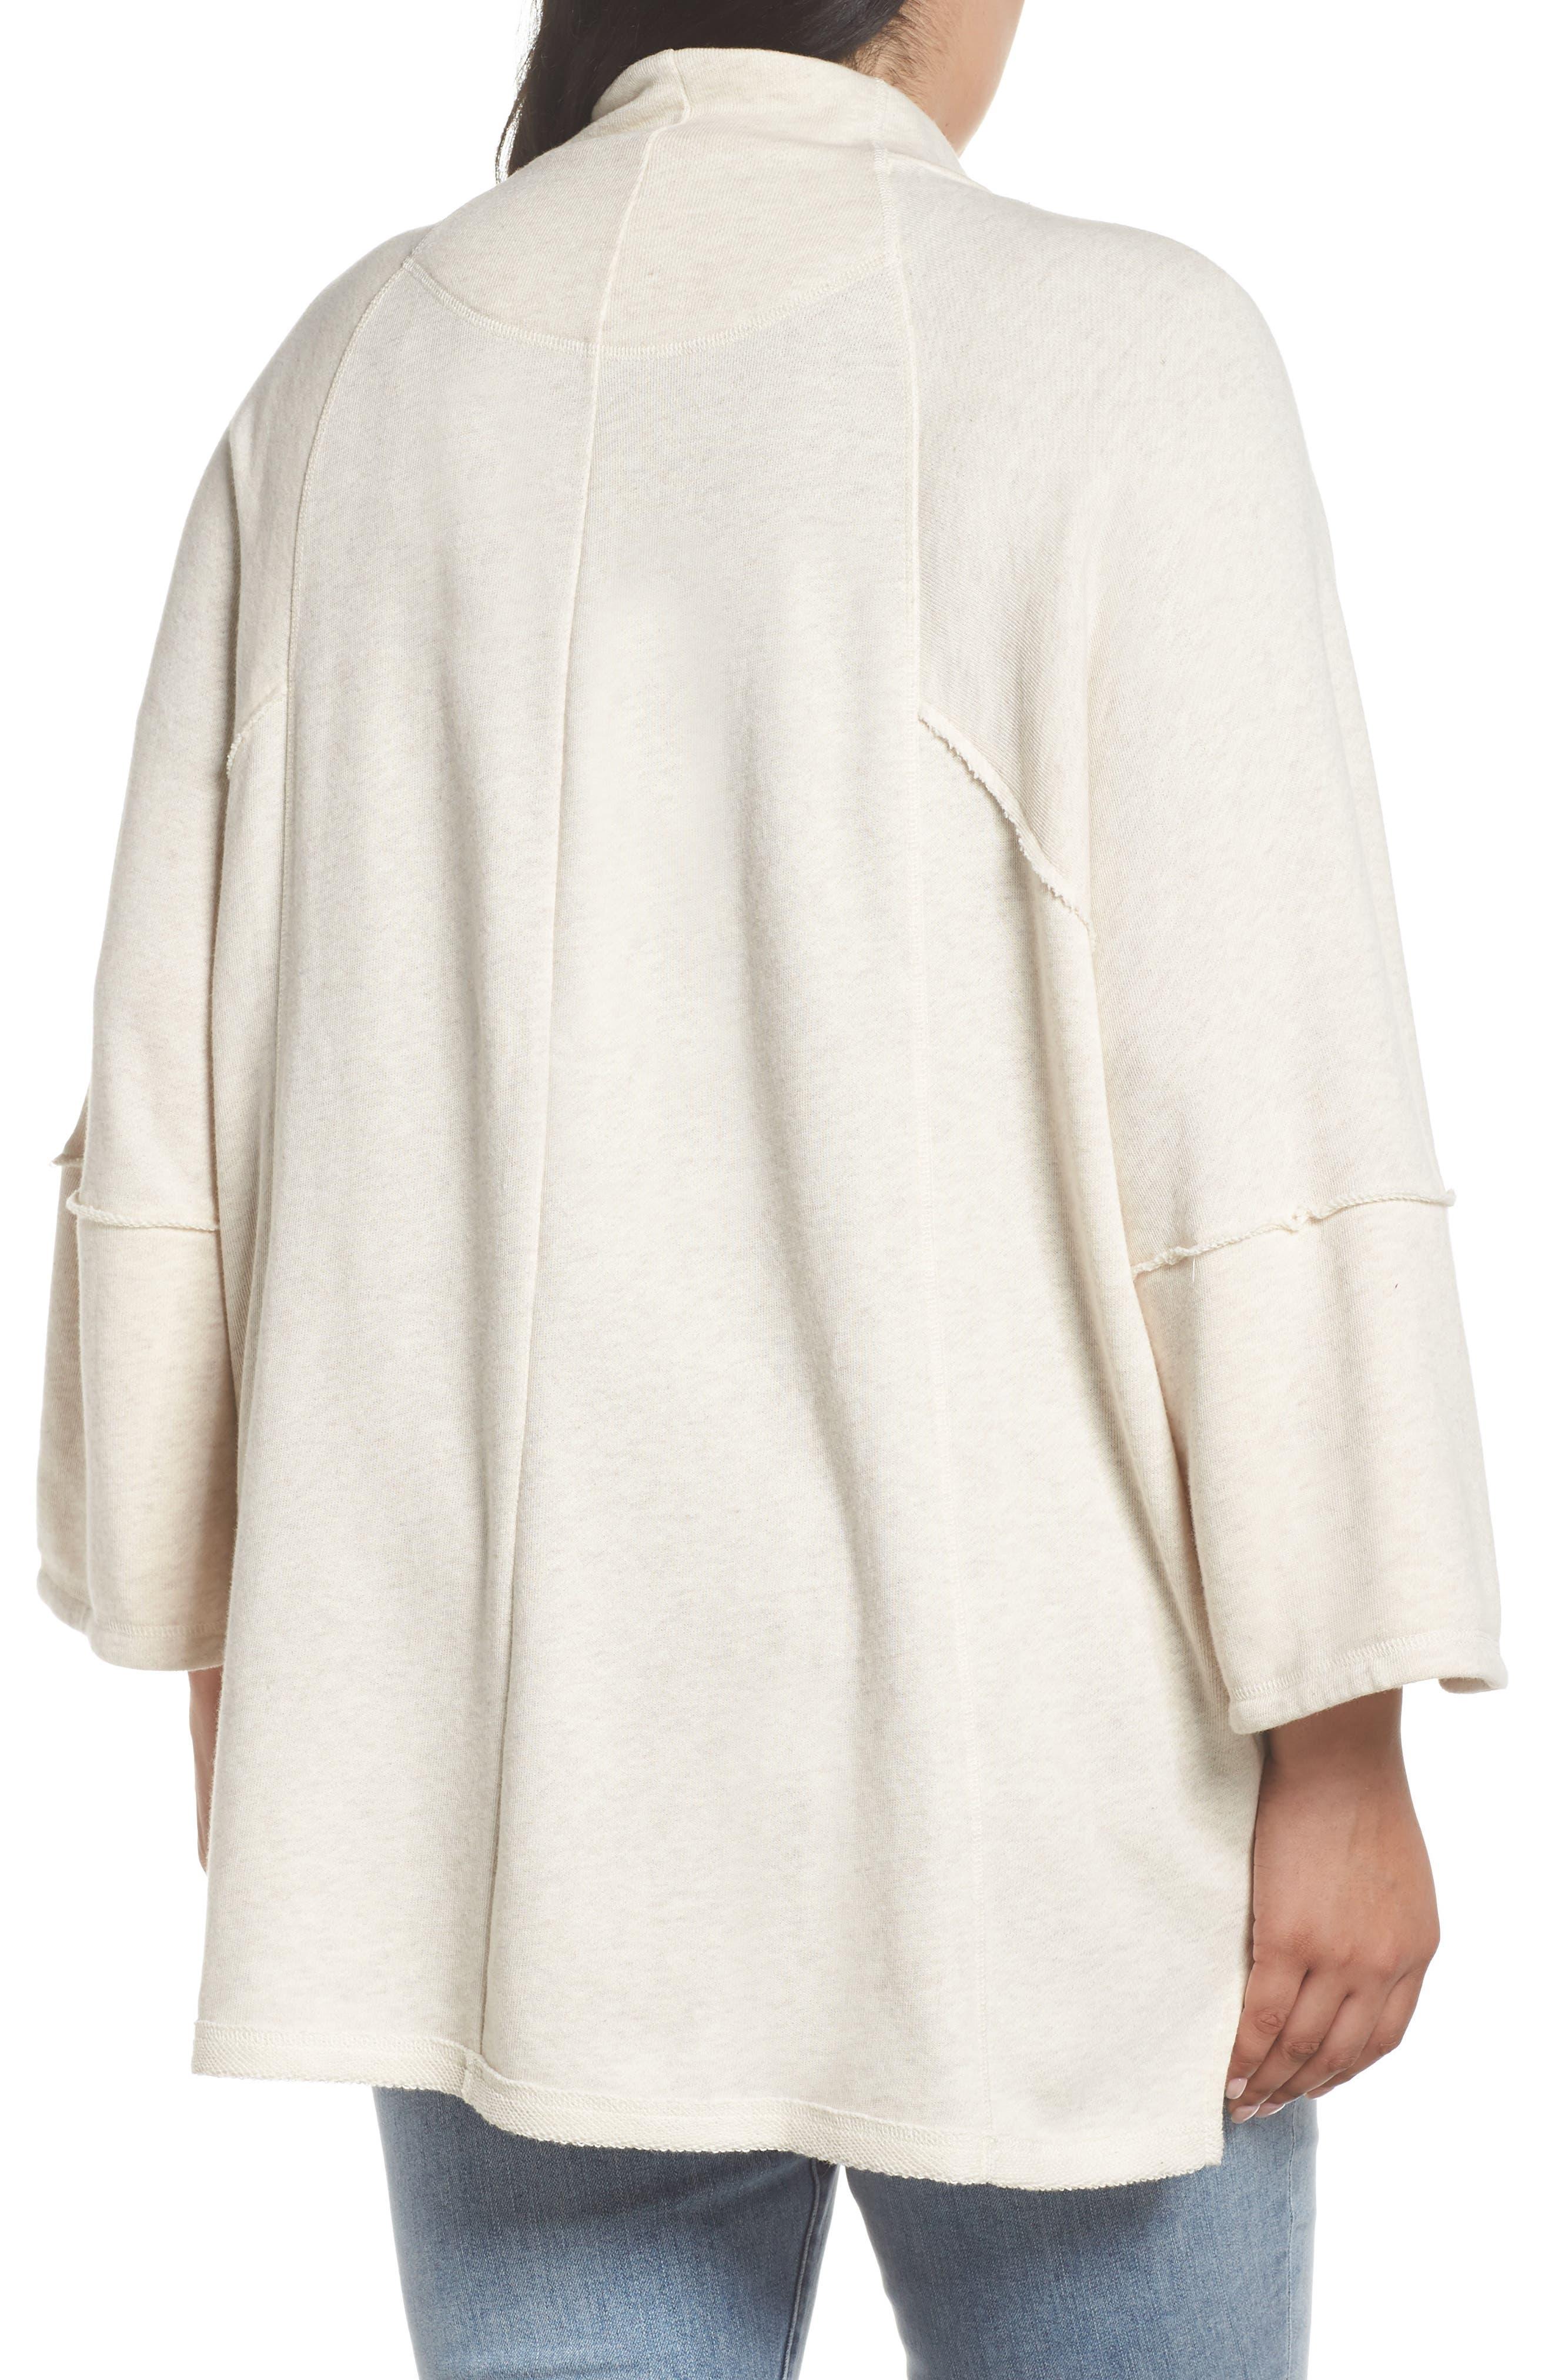 Button Front Knit Jacket,                             Alternate thumbnail 2, color,                             270